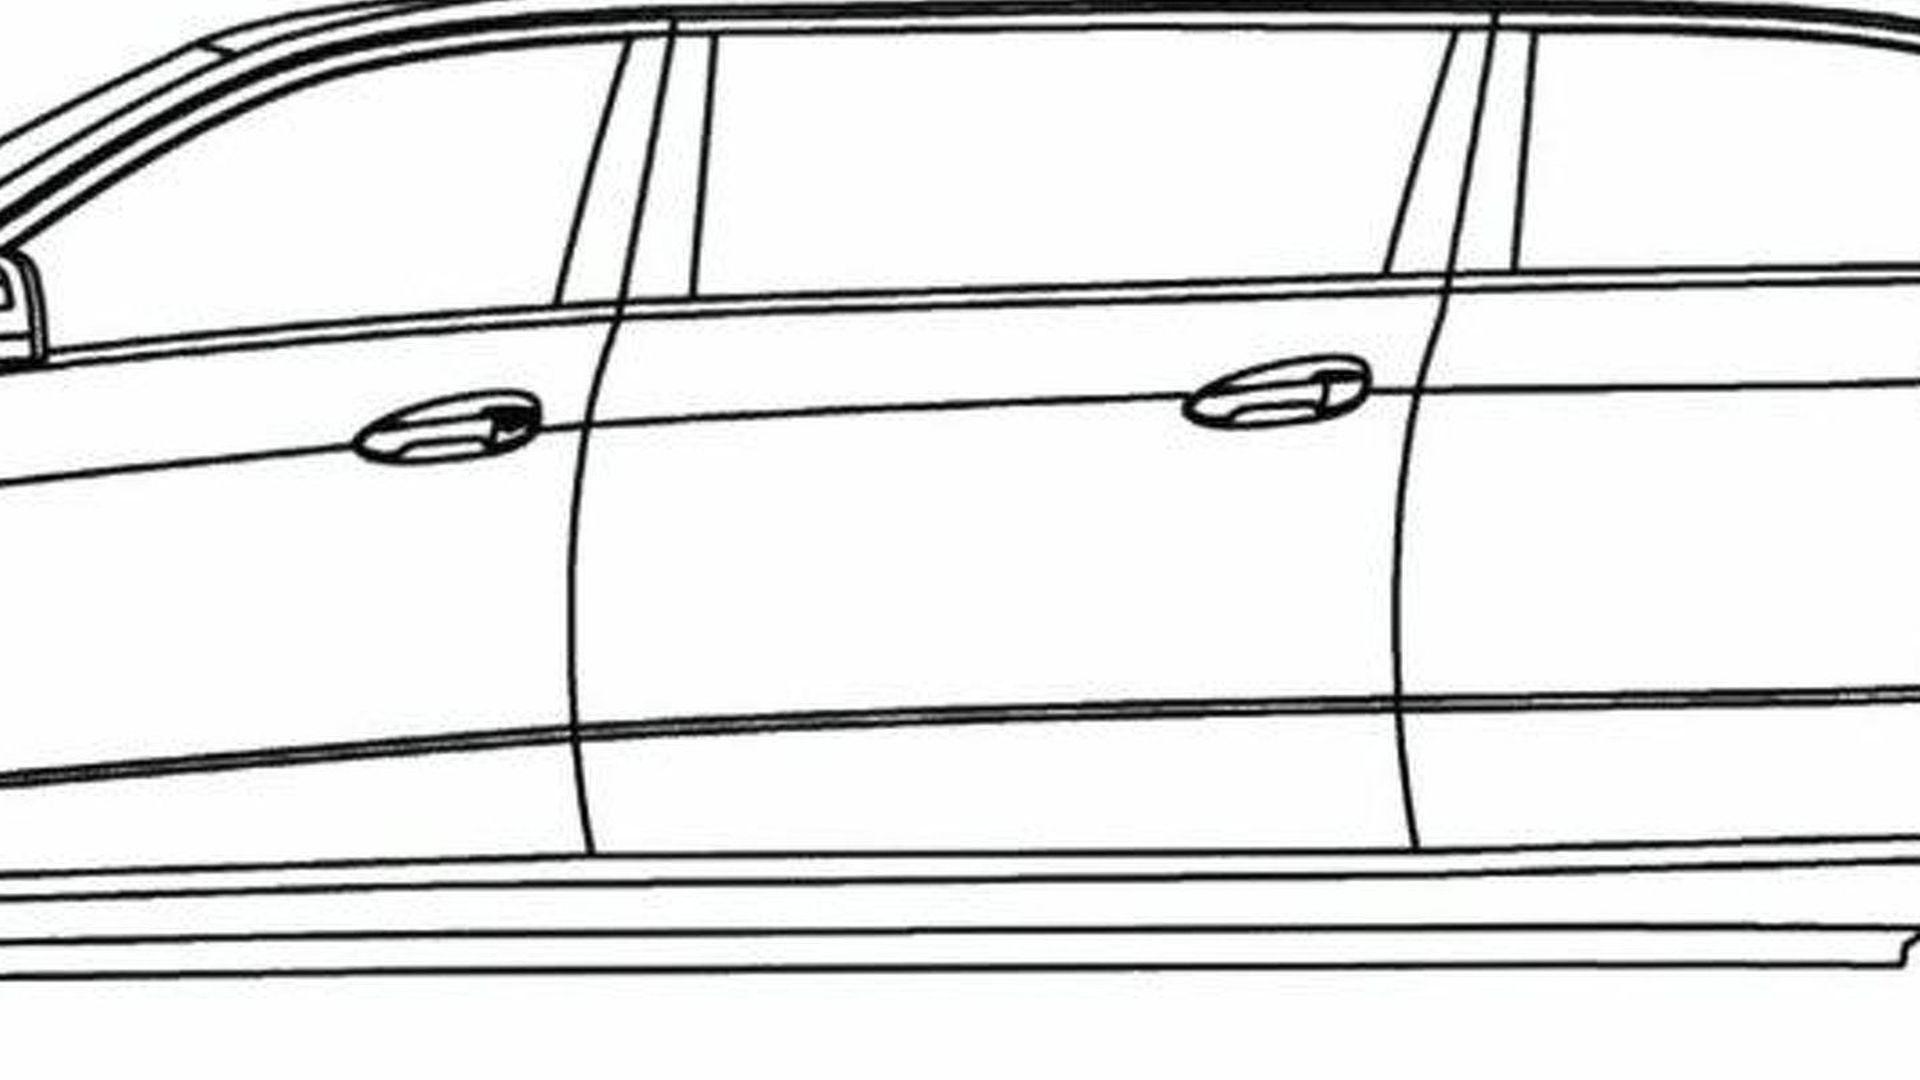 Mercedes E Class Limo Sketches Surface